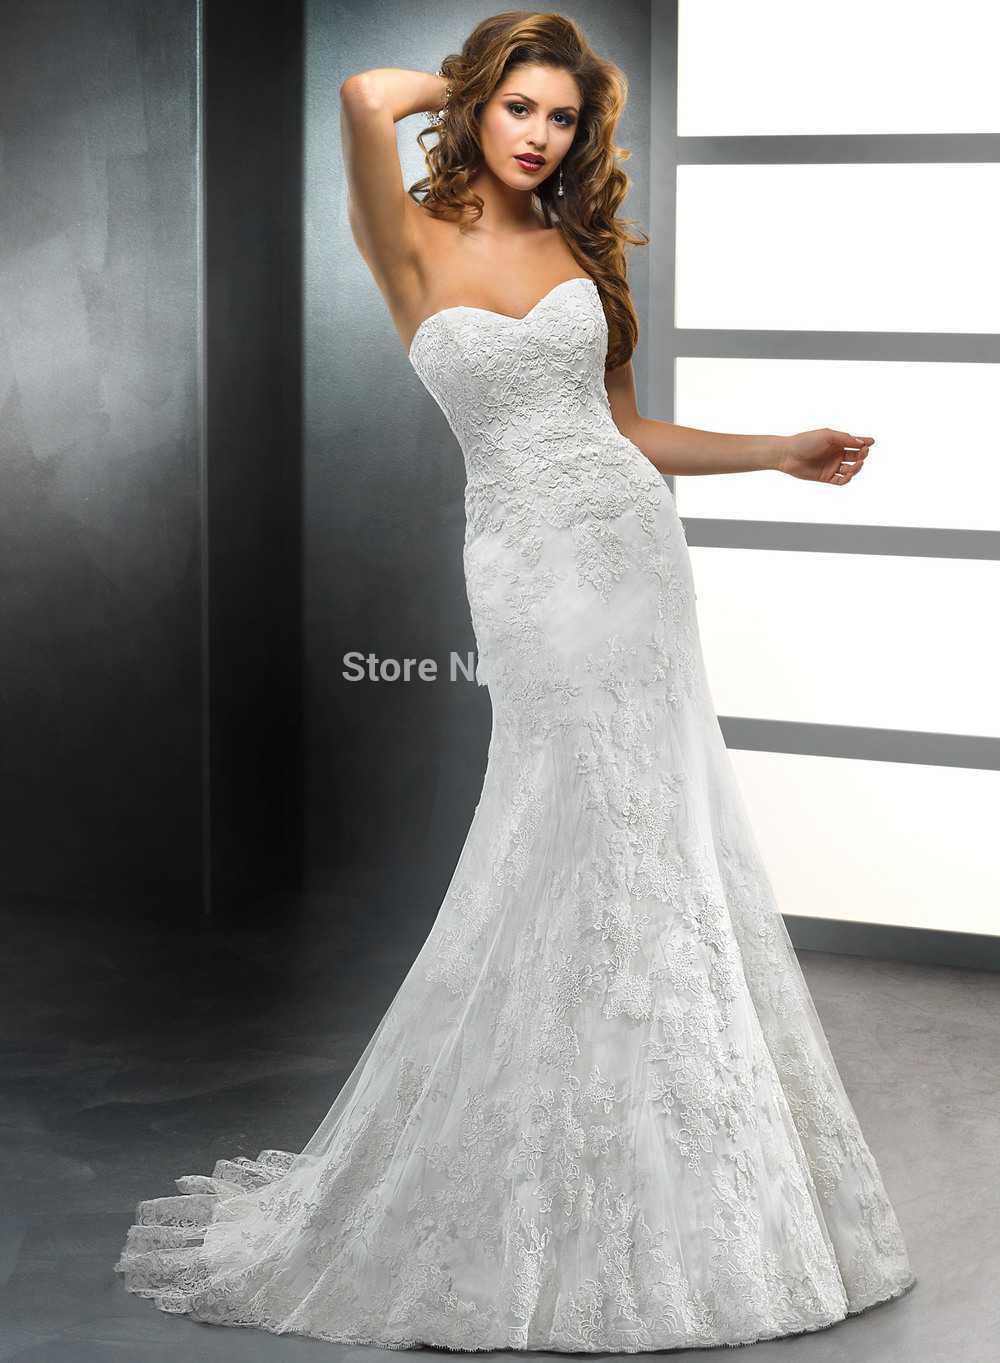 Robe De Marriage Mermaid Strapless Mermaid Lace Elegant Vestido De Noiva Casamento Bridal Gown 2018 Mother Of The Bride Dresses